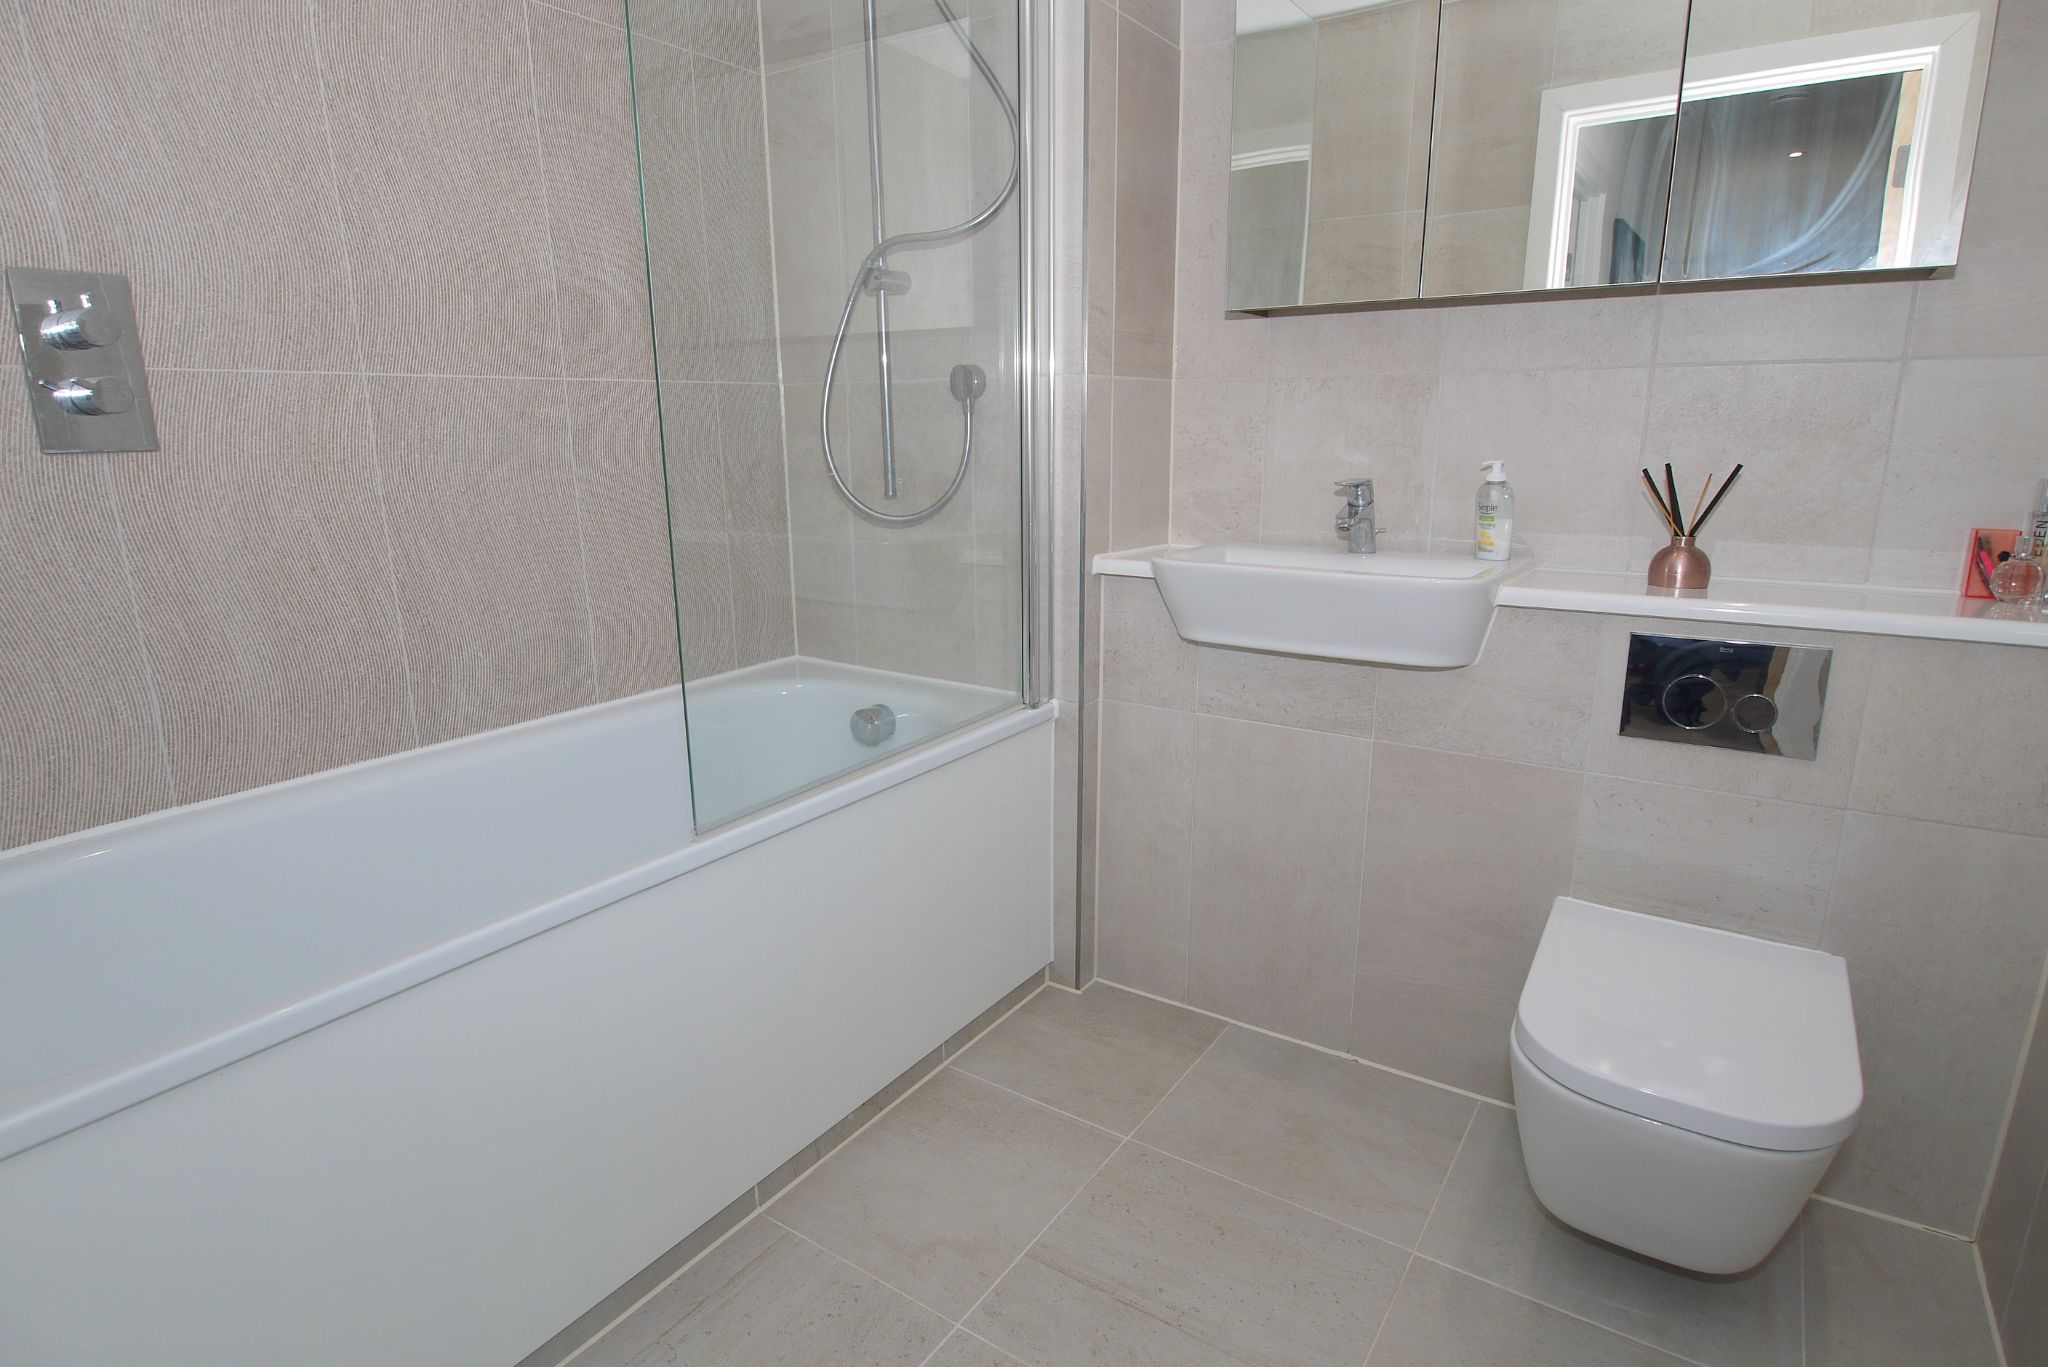 2 bedroom apartment For Sale in Sevenoaks - Photograph 5